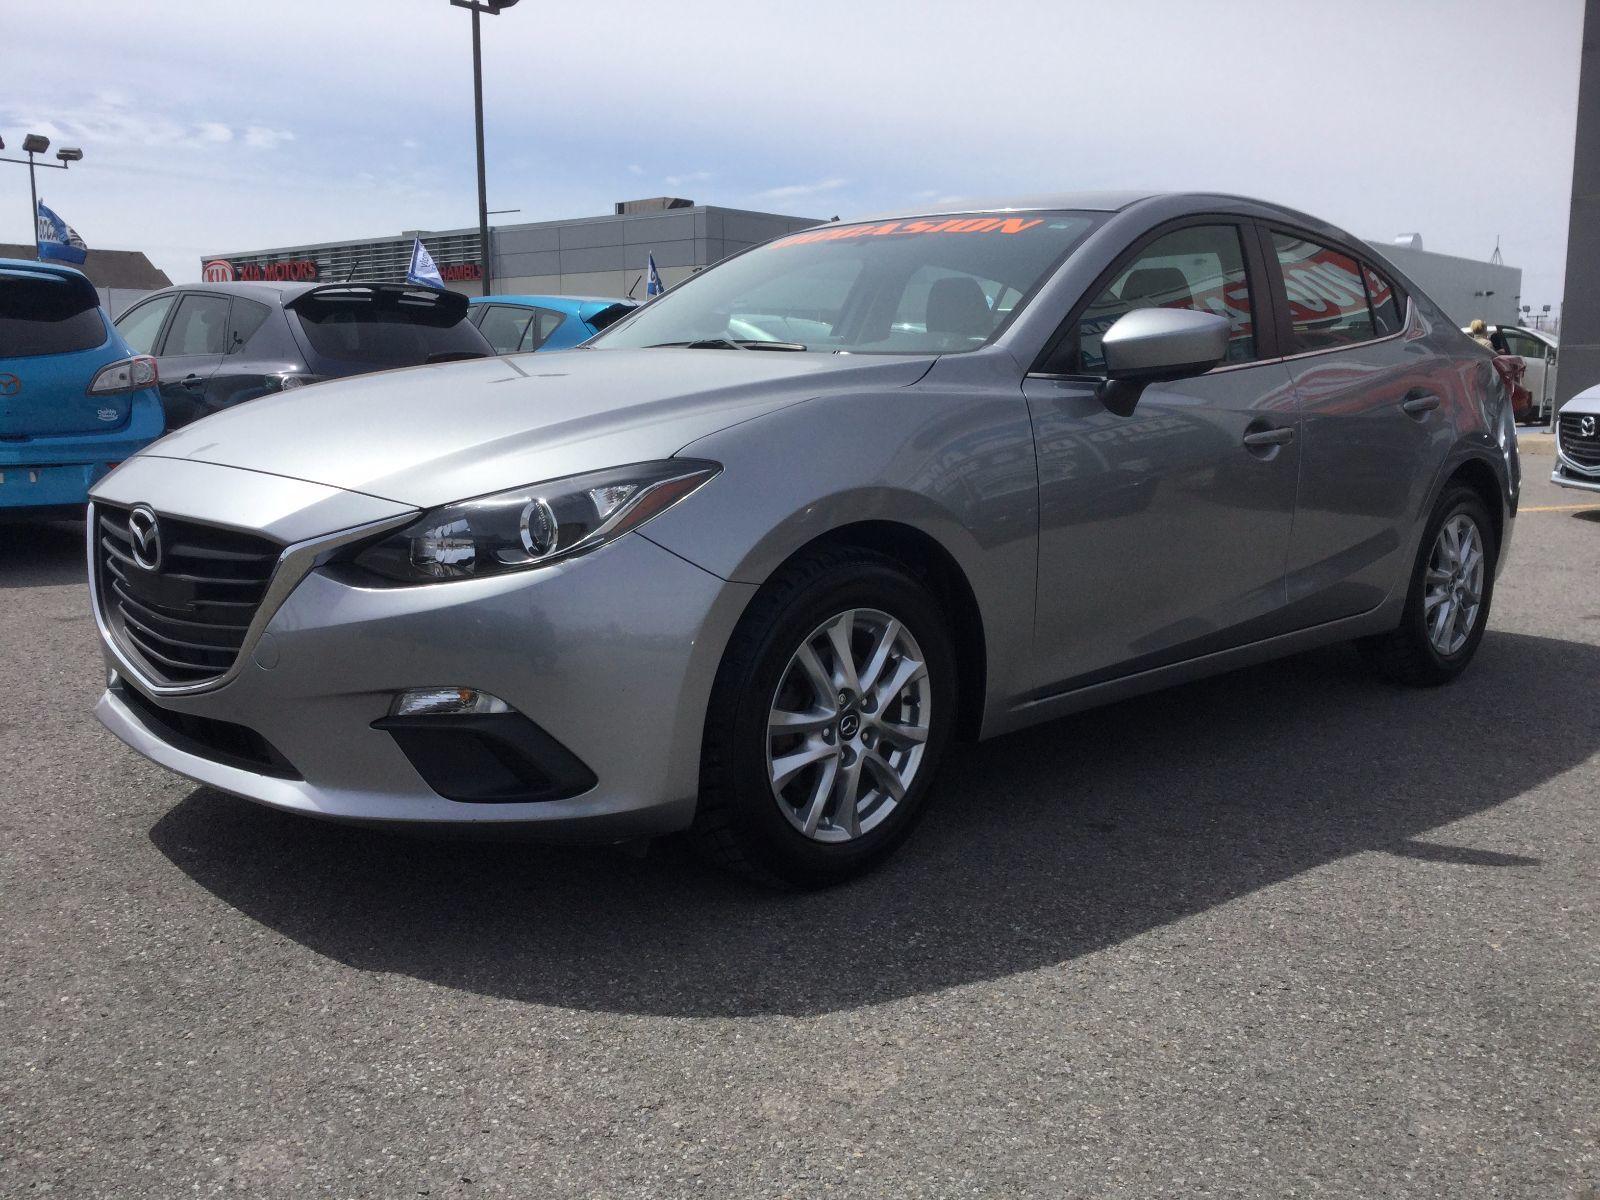 Mazda Mazda3 GS-SKY, CAMÉRA DE RECULE,BLUETOOTH, COMMANDE VOCAL 2014 UN SEUL PROPRIÉTAIRE